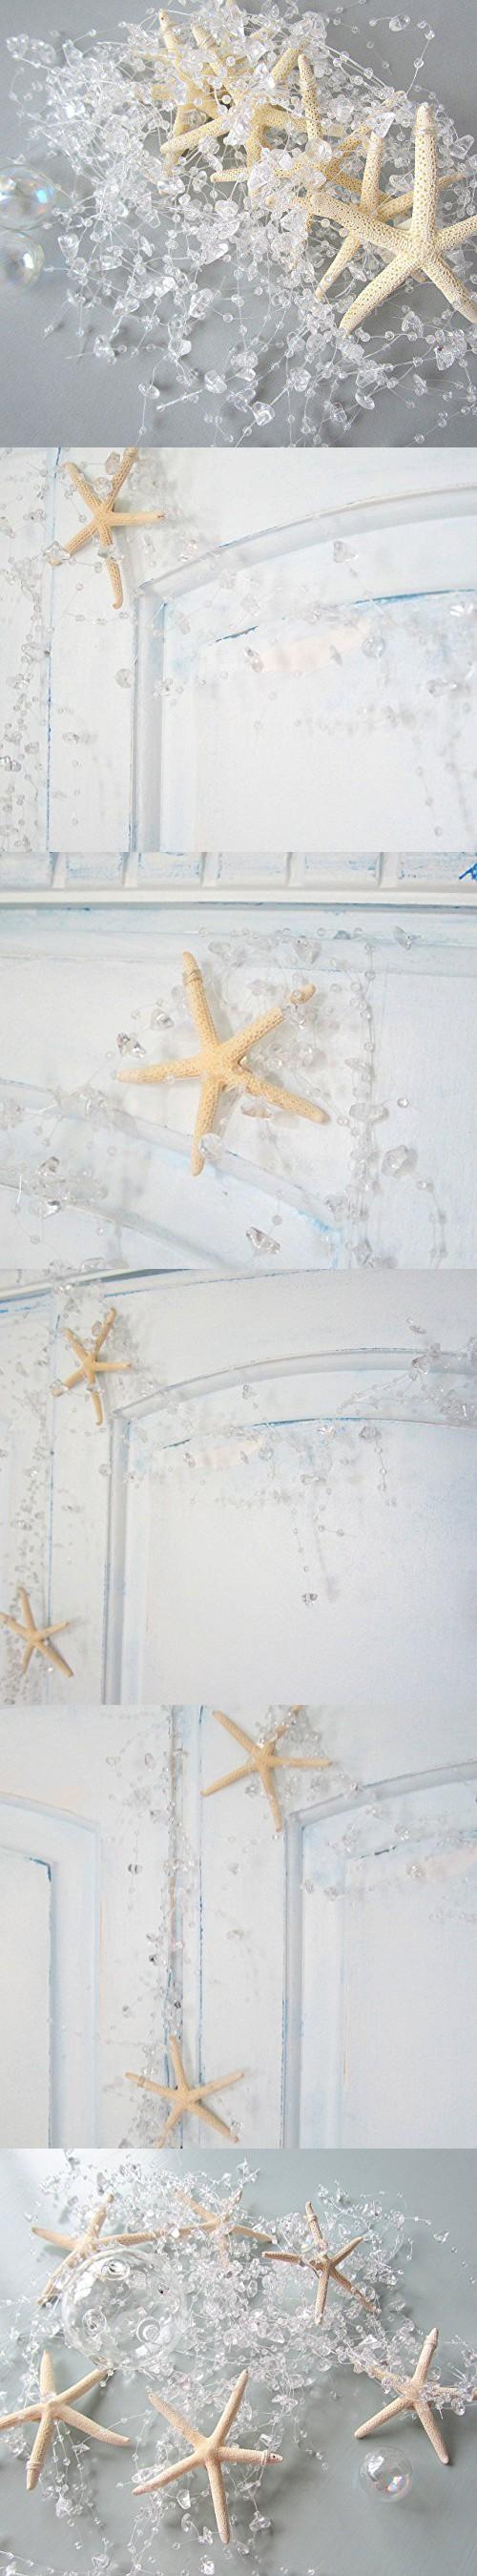 Beach Decor Nautical Beaded Starfish Garland - White Starfish Decorative Garland - 5FT - #BSFG CLEAR